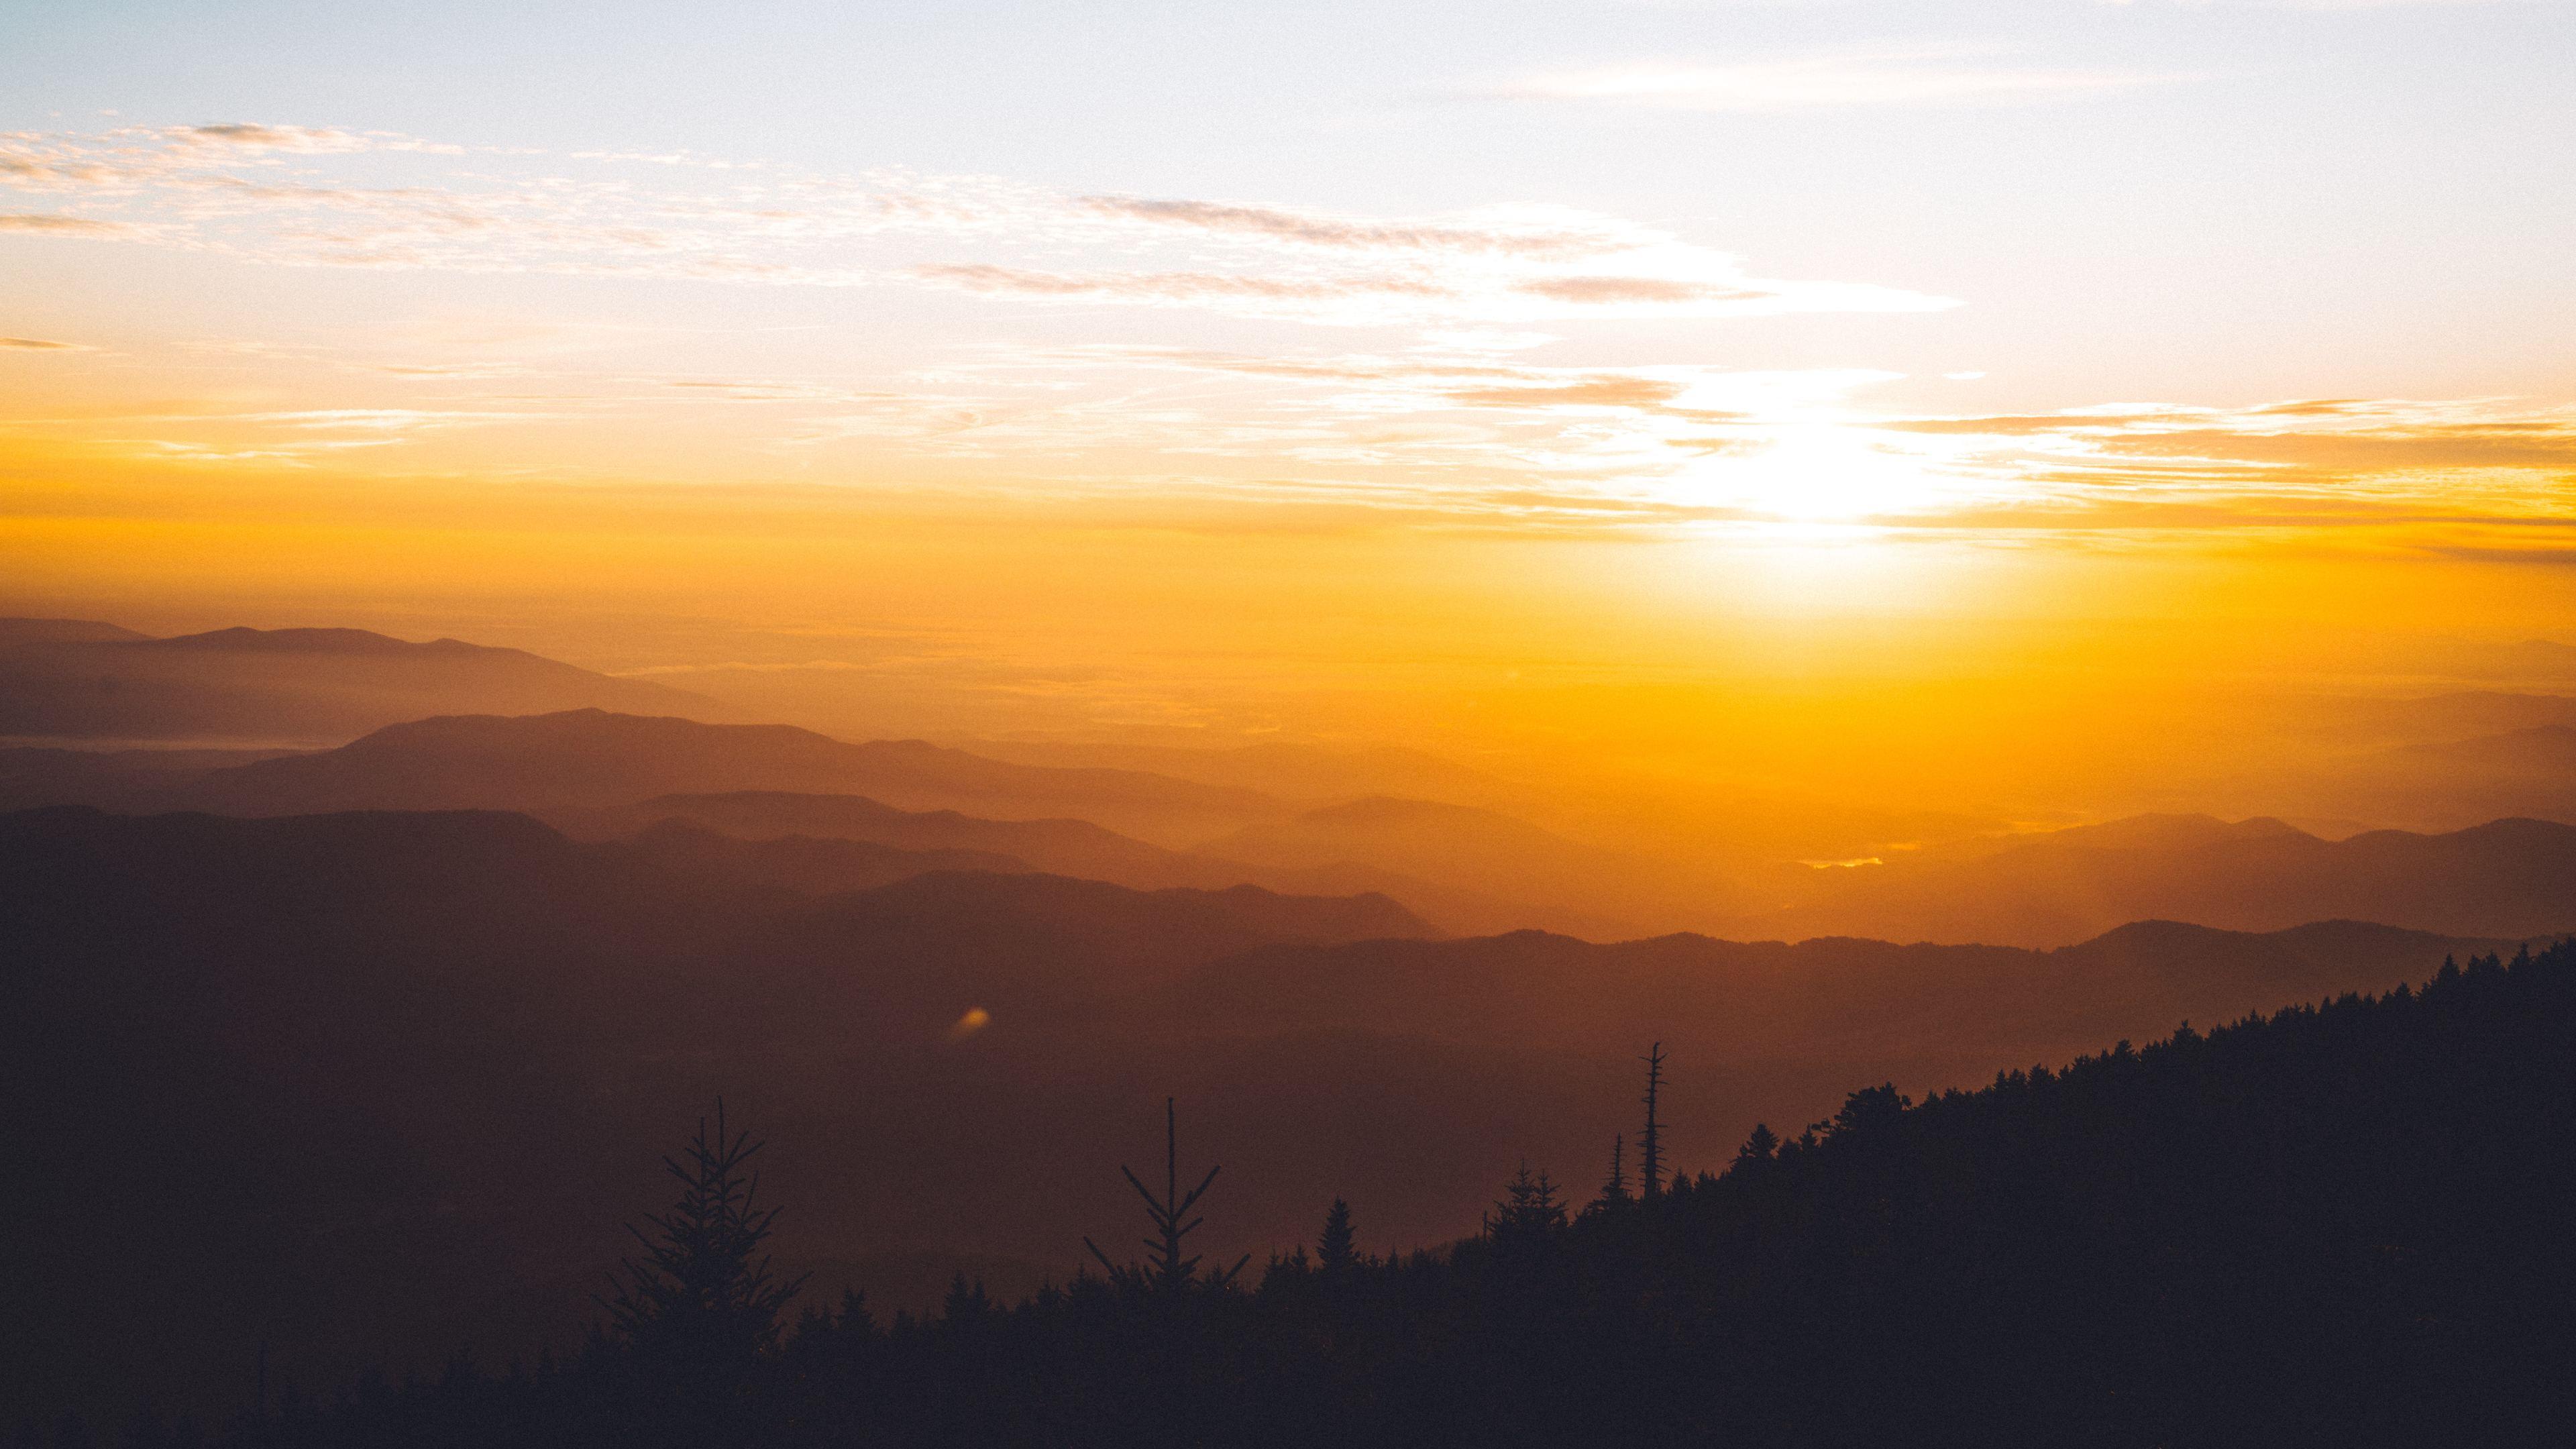 blue ridge valley sky forest sunrise 1540140954 - Blue Ridge Valley Sky Forest Sunrise - sunrise wallpapers, sky wallpapers, nature wallpapers, hd-wallpapers, forest wallpapers, 5k wallpapers, 4k-wallpapers